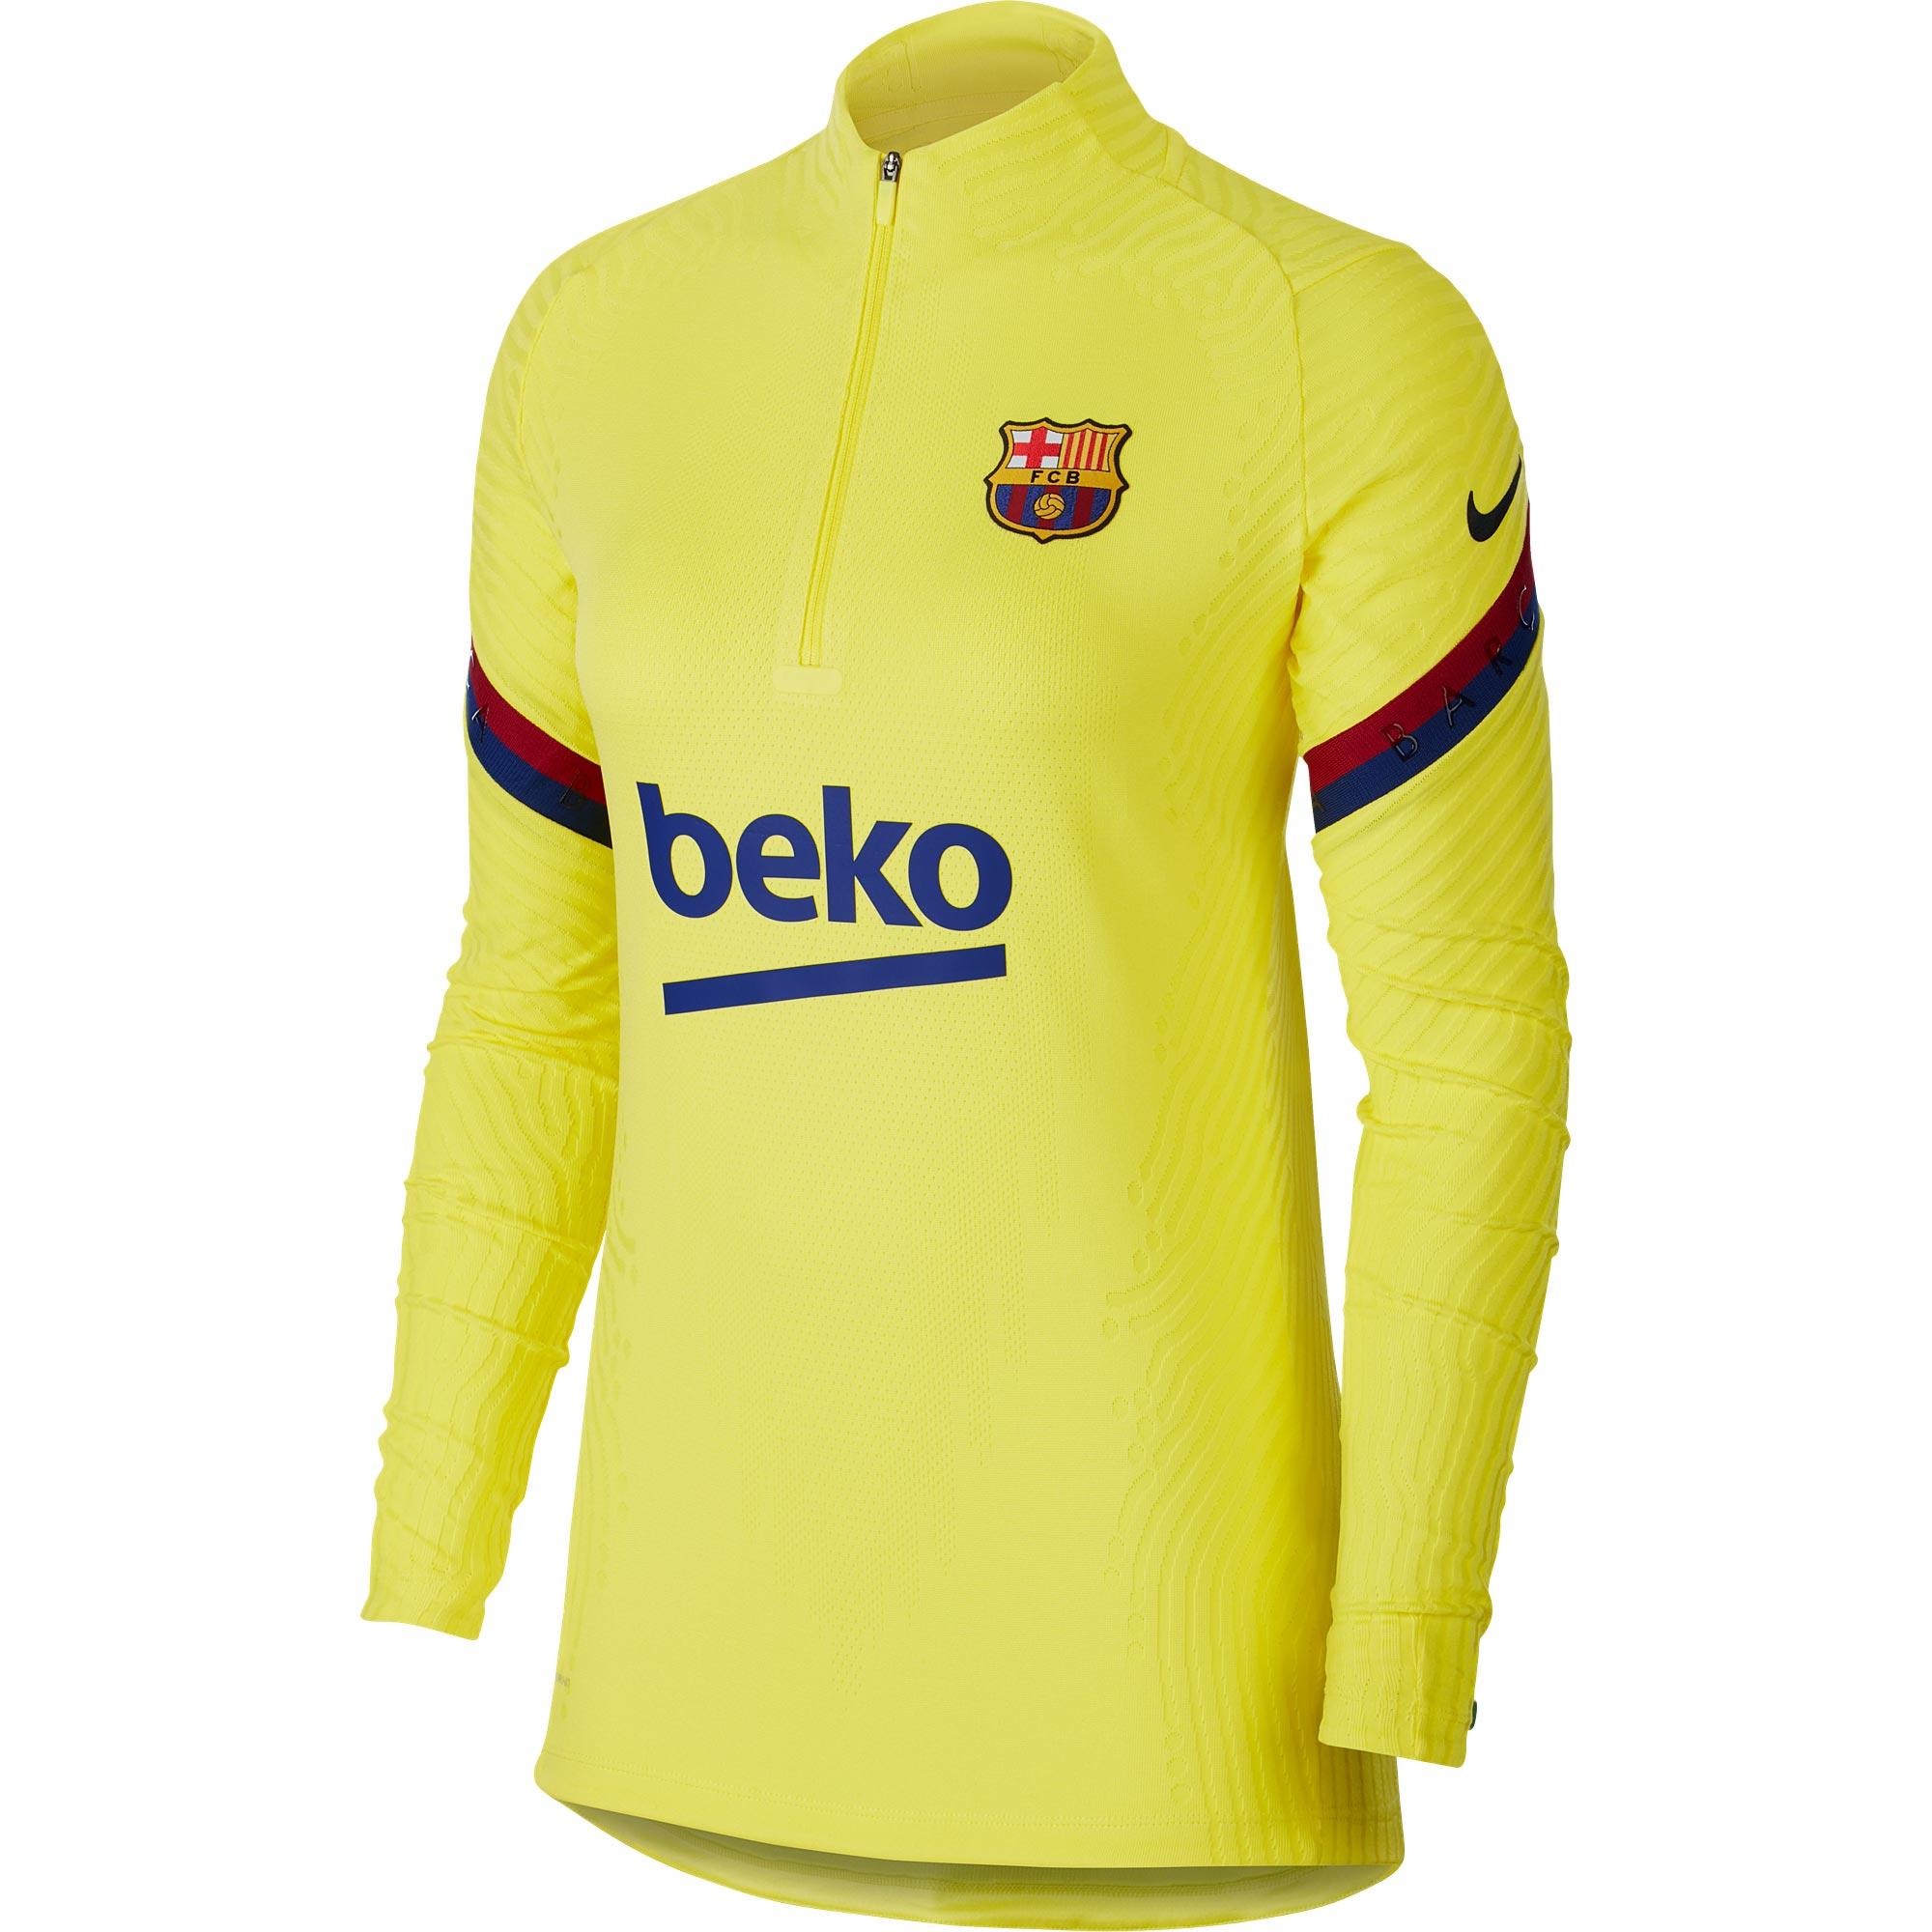 Camiseta Vaporknit Strike Drill de Nike del Barcelona - Hombre